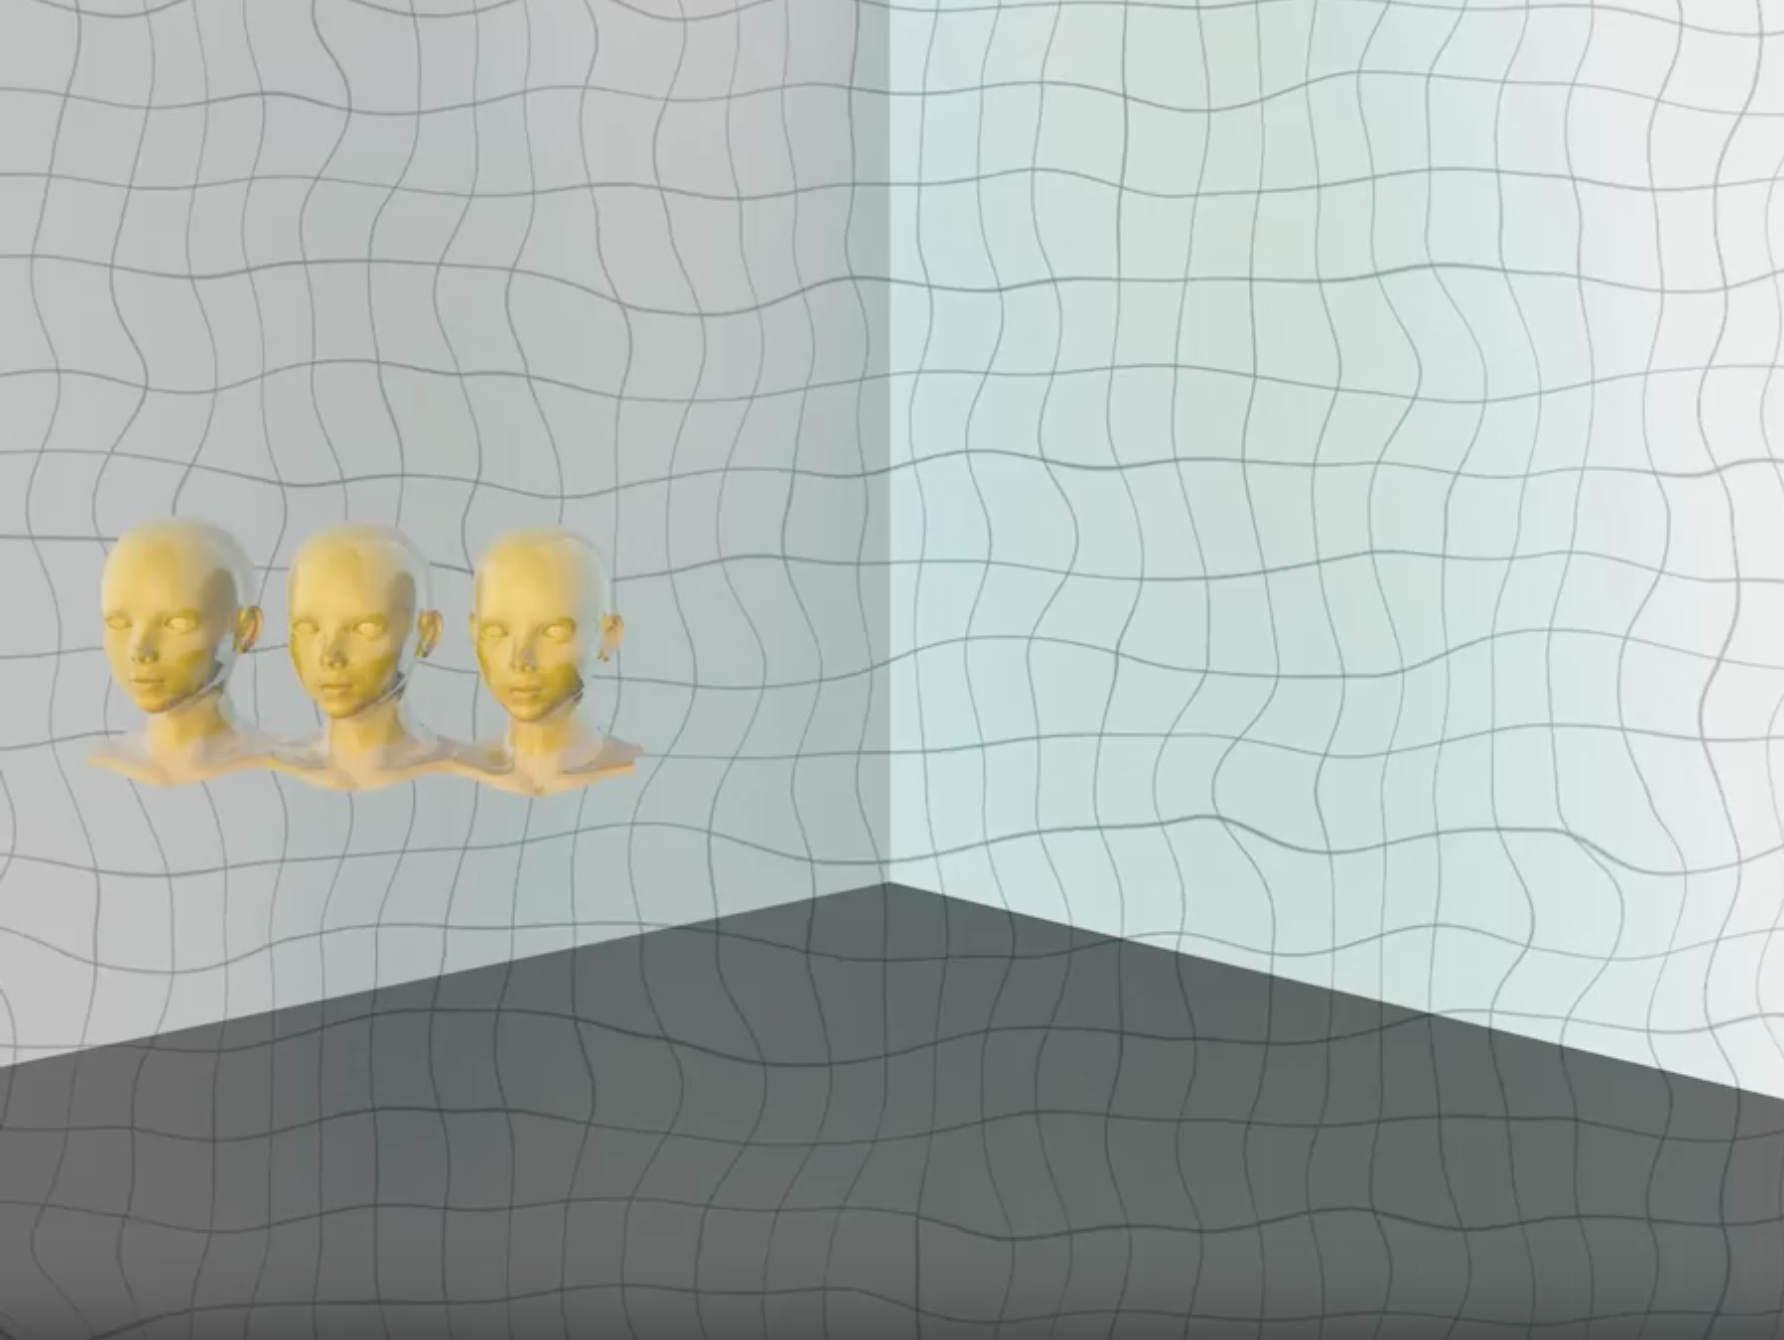 Shades of Head